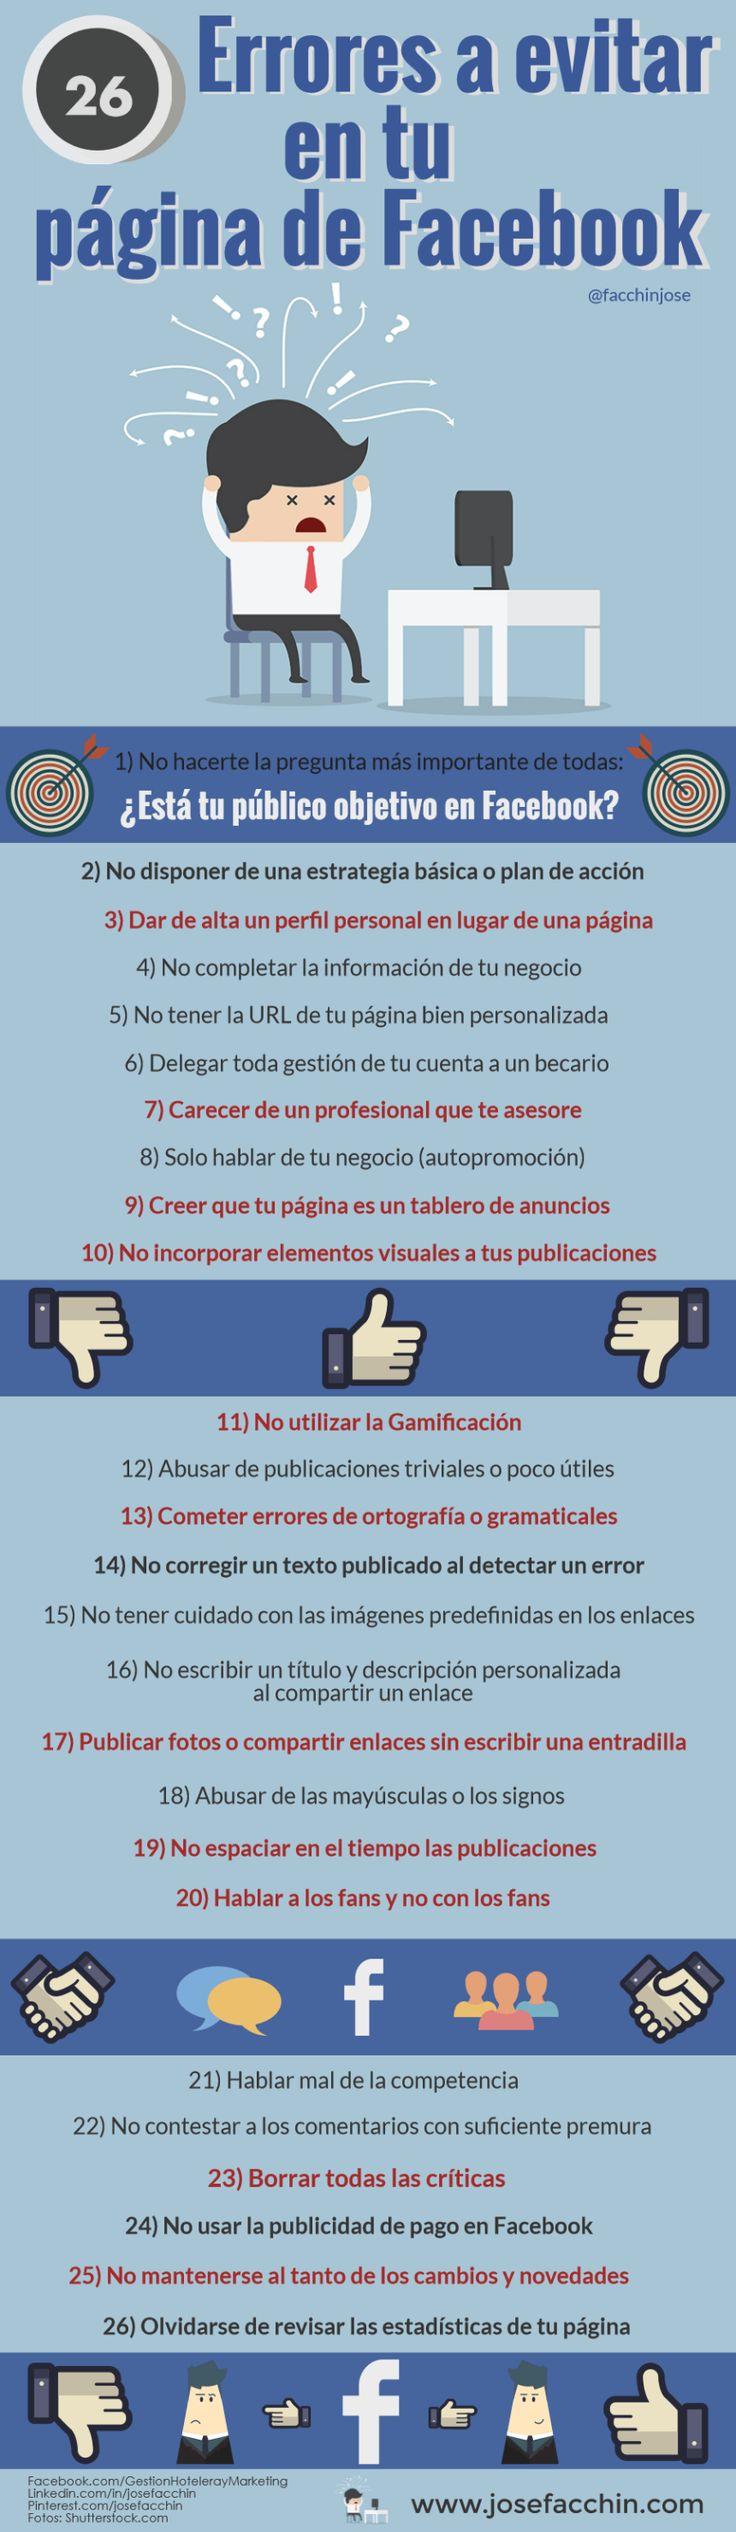 26 ERRORES A EVITAR EN TU PÁGINA DE FACEBOOK #INFOGRAFIA #SOCIALMEDIA #MARKETING